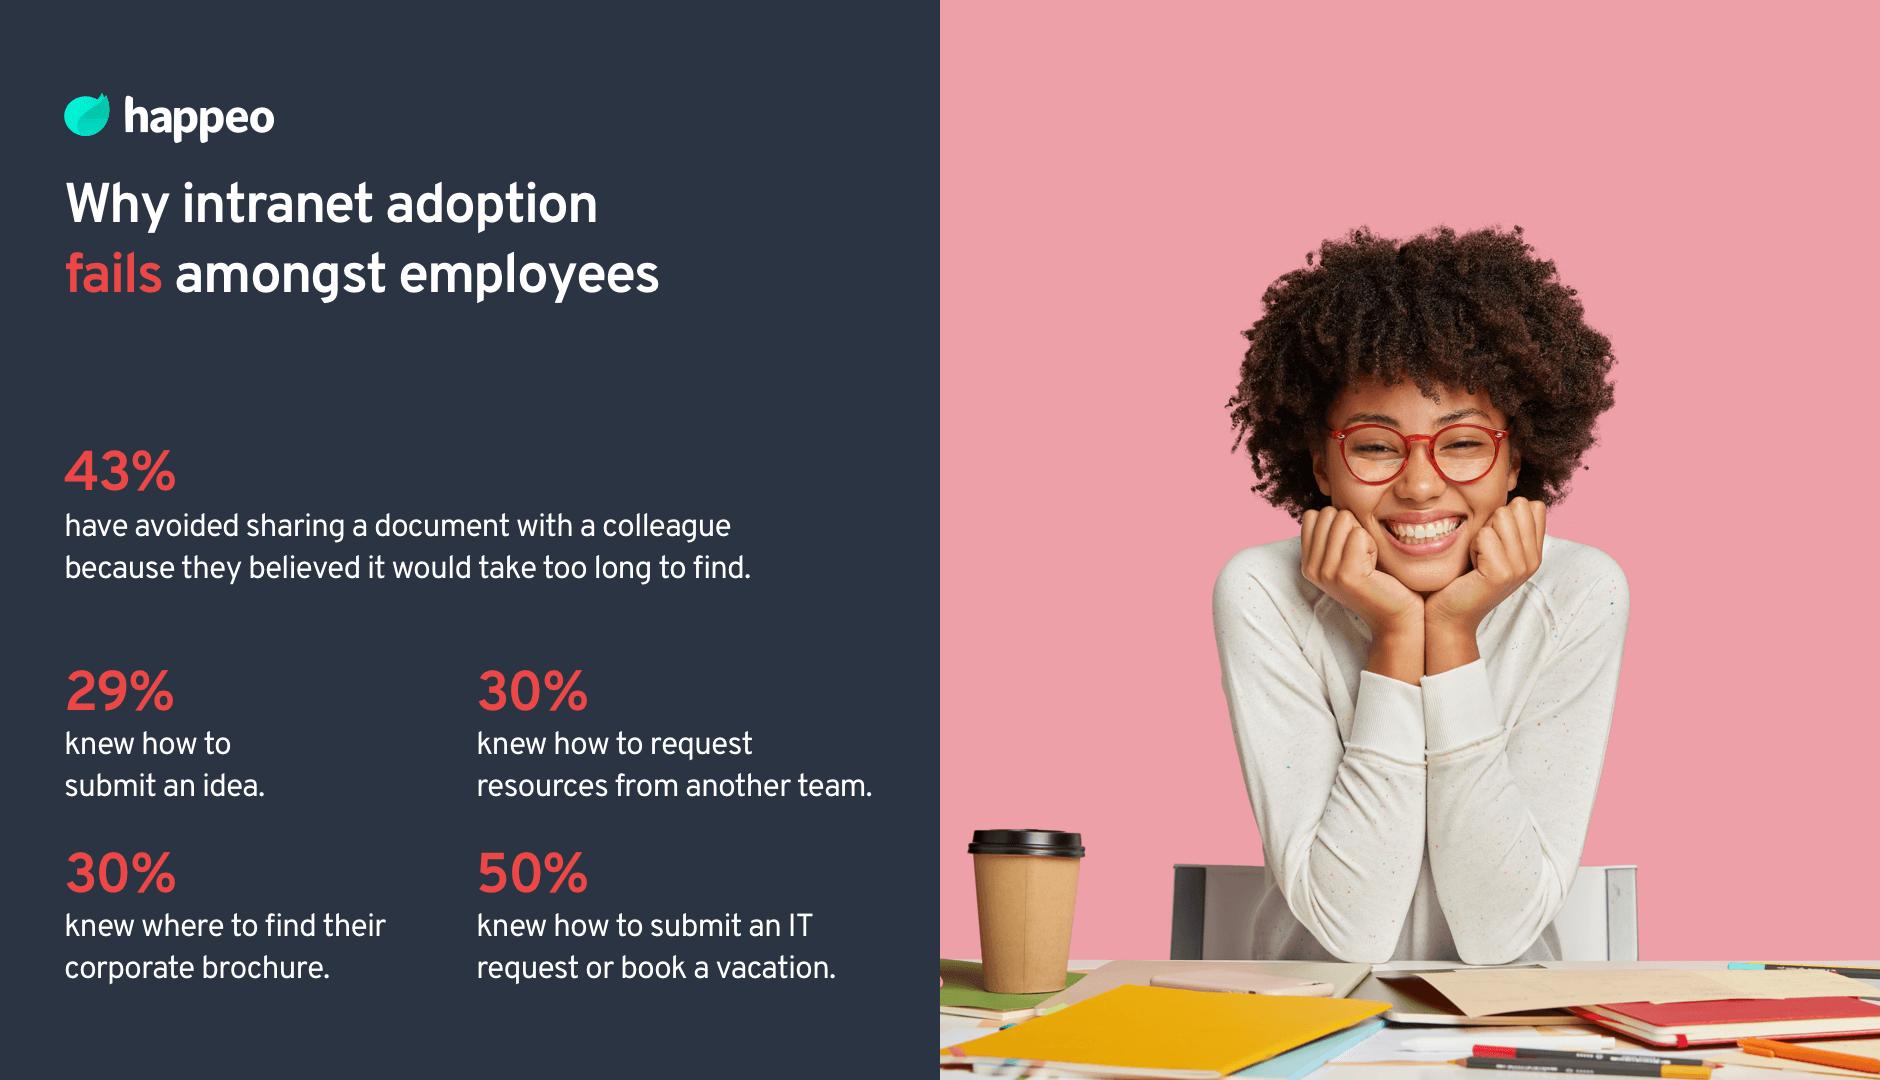 Why intranet adoption fails